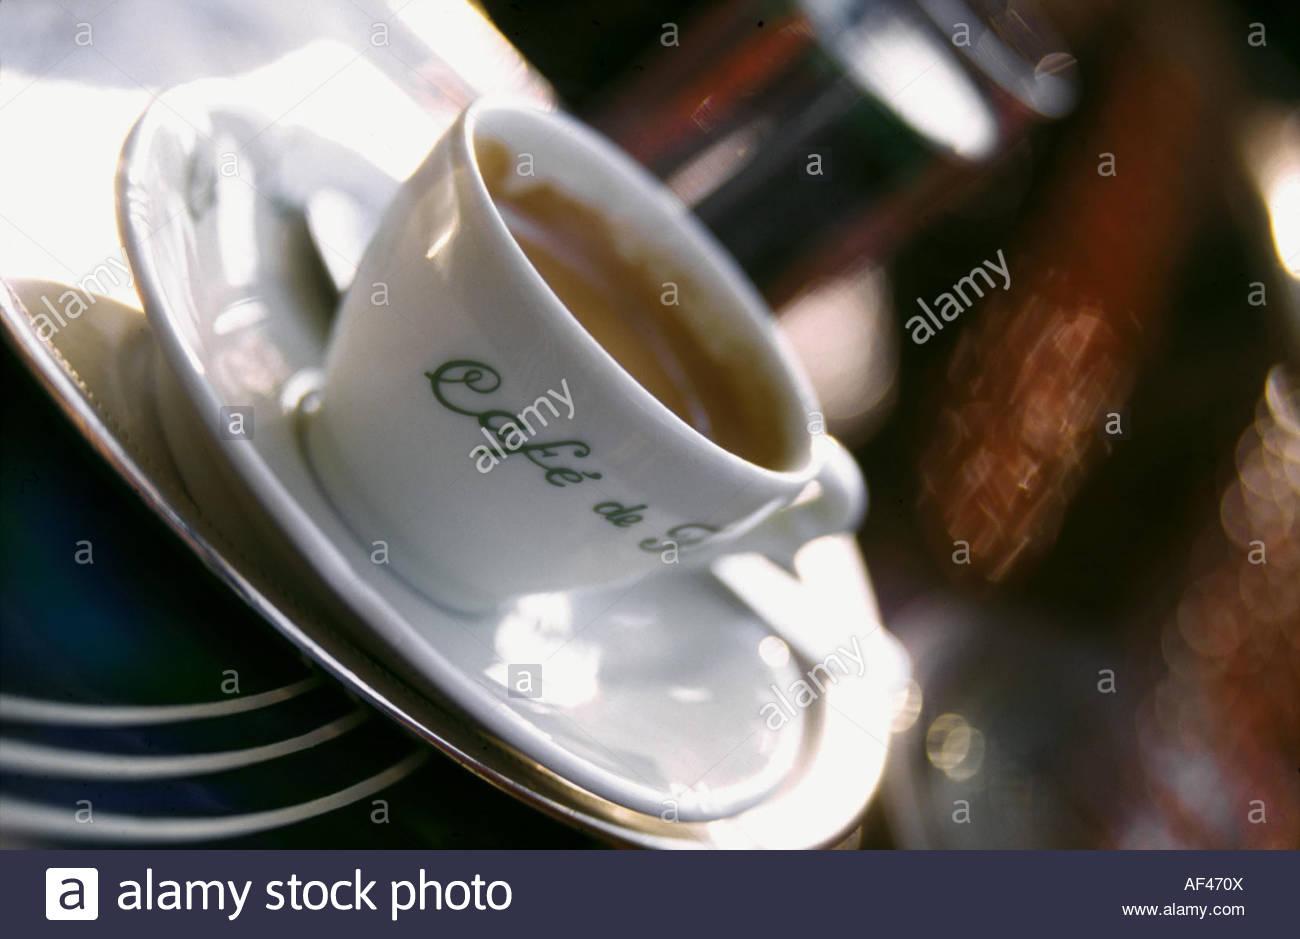 A cup of coffee on a table at the Café de Flore, Paris (1) Stock Photo